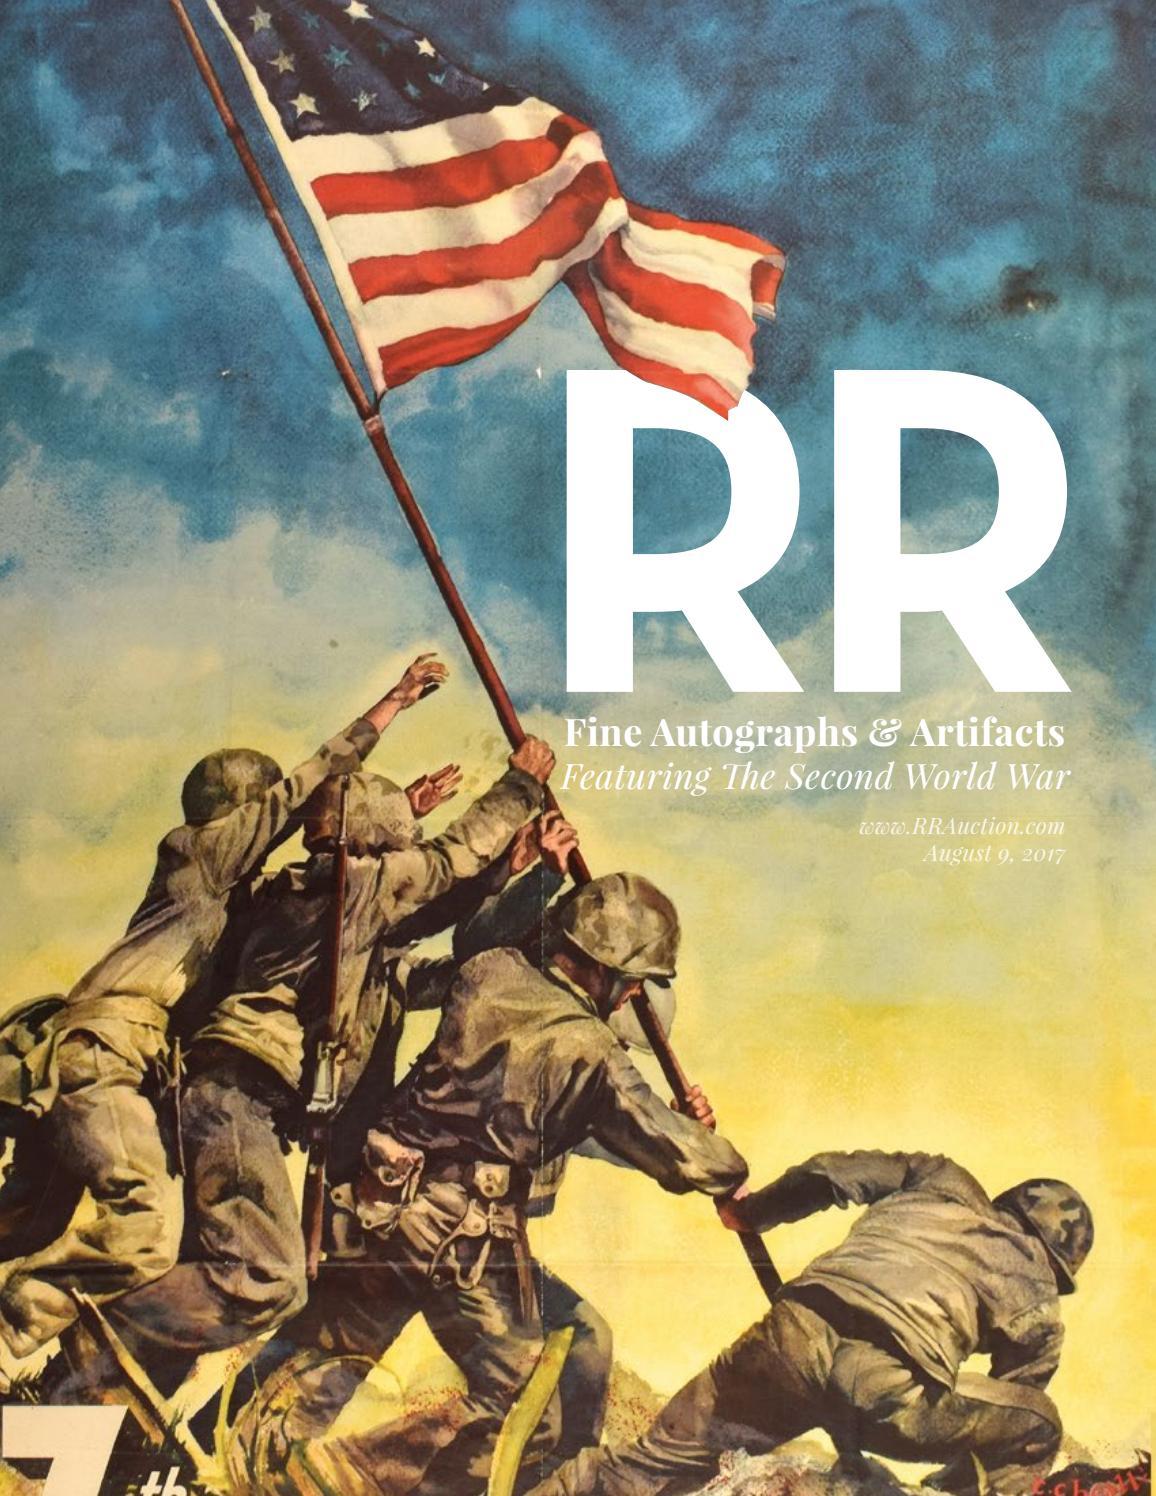 Rr Autograph Auctions Consignment Agreement: RR Auction: August 2017 Fine Autograph And Artifact